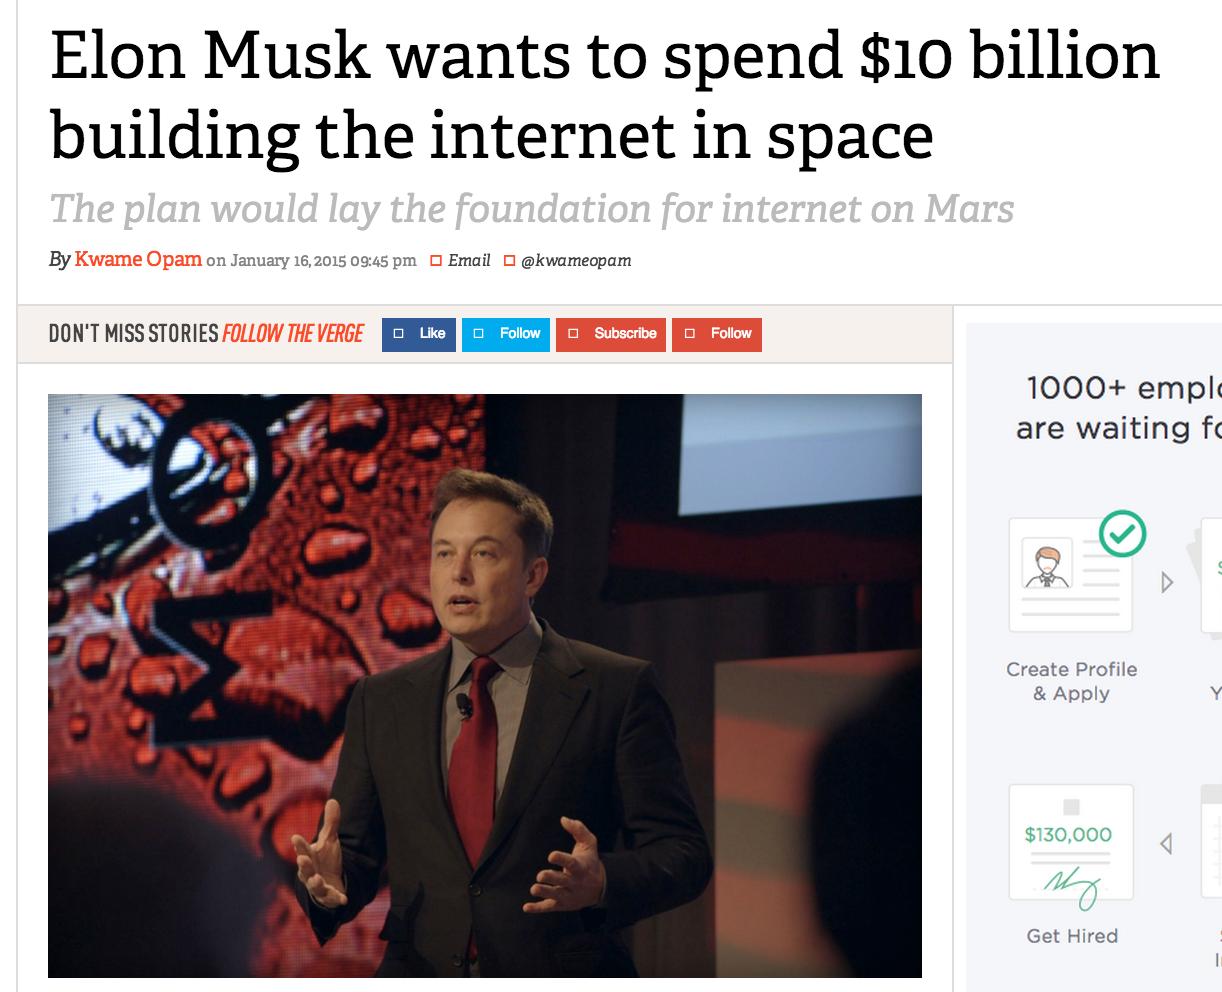 Elon Musk announces Space Internet